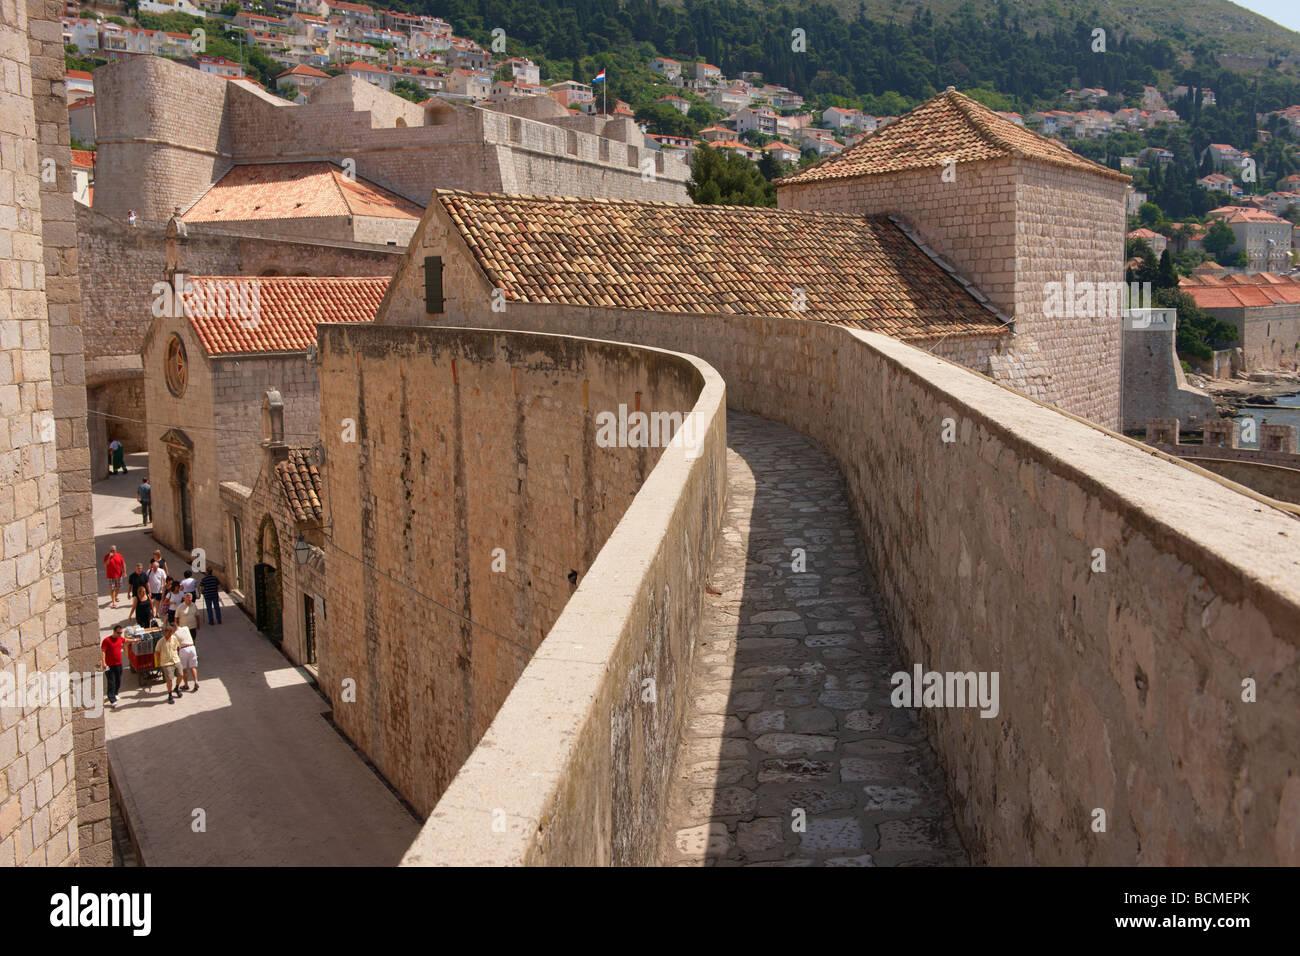 City walls of Dubrovnik - Croatia - Stock Image